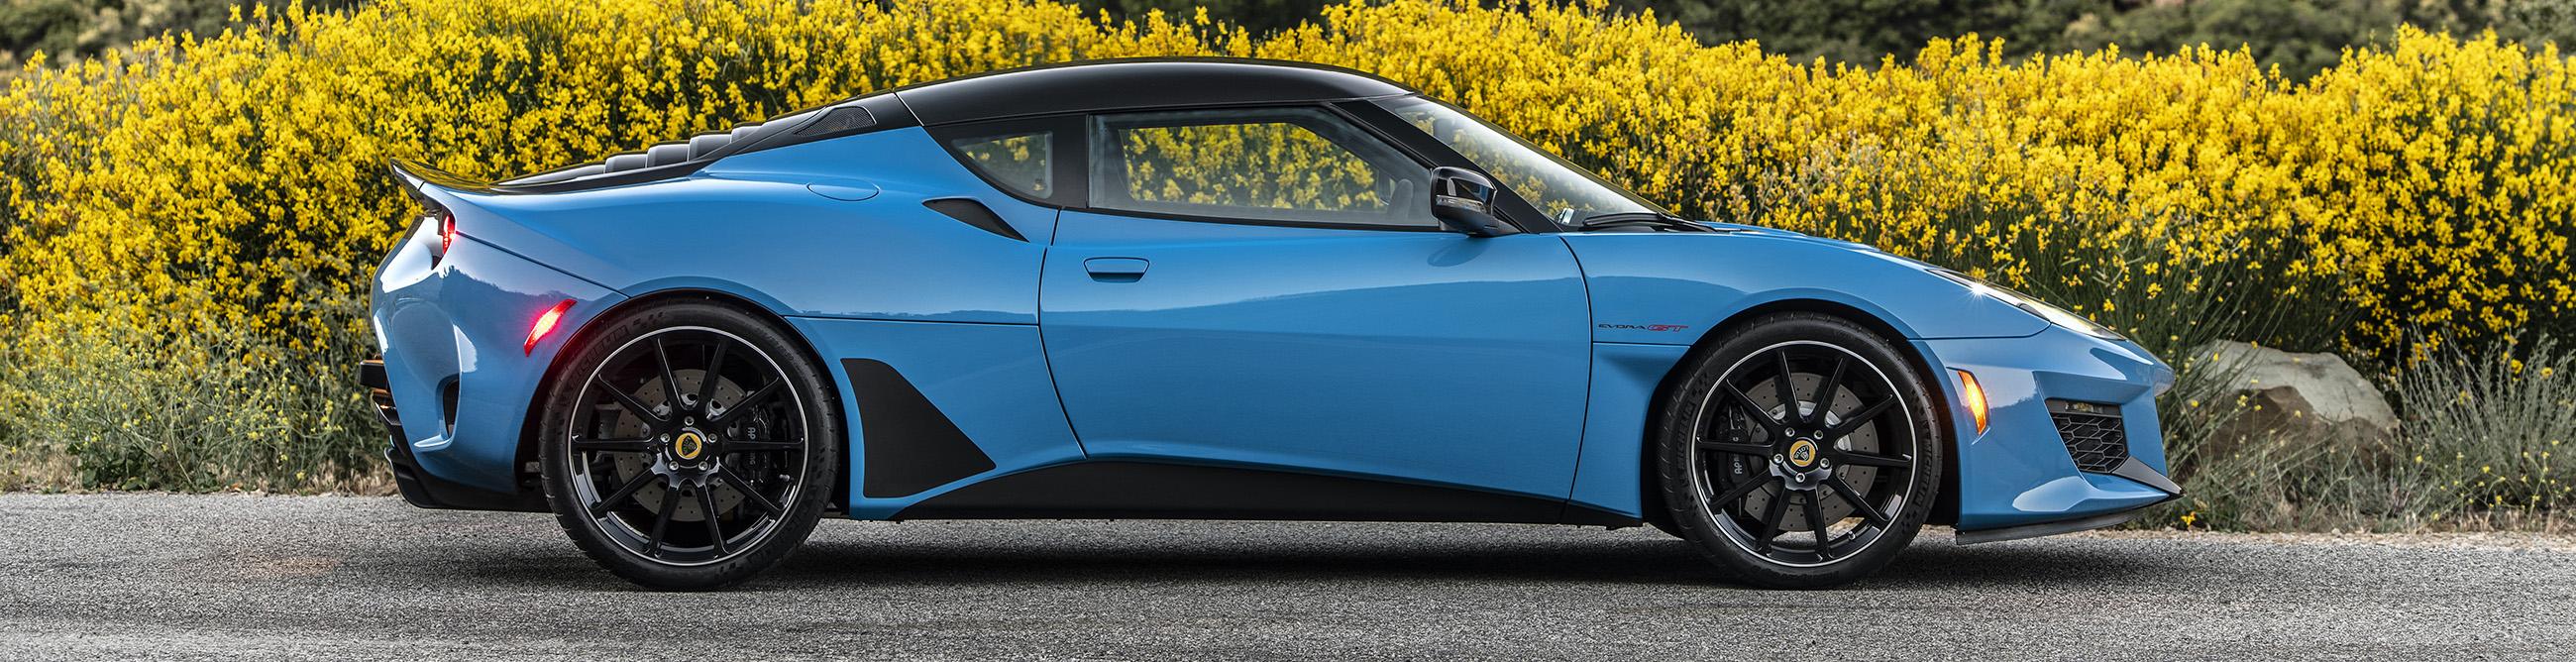 Calendrier 2020 Side Car Cross.2020 Lotus Evora Gt Review Bloomberg